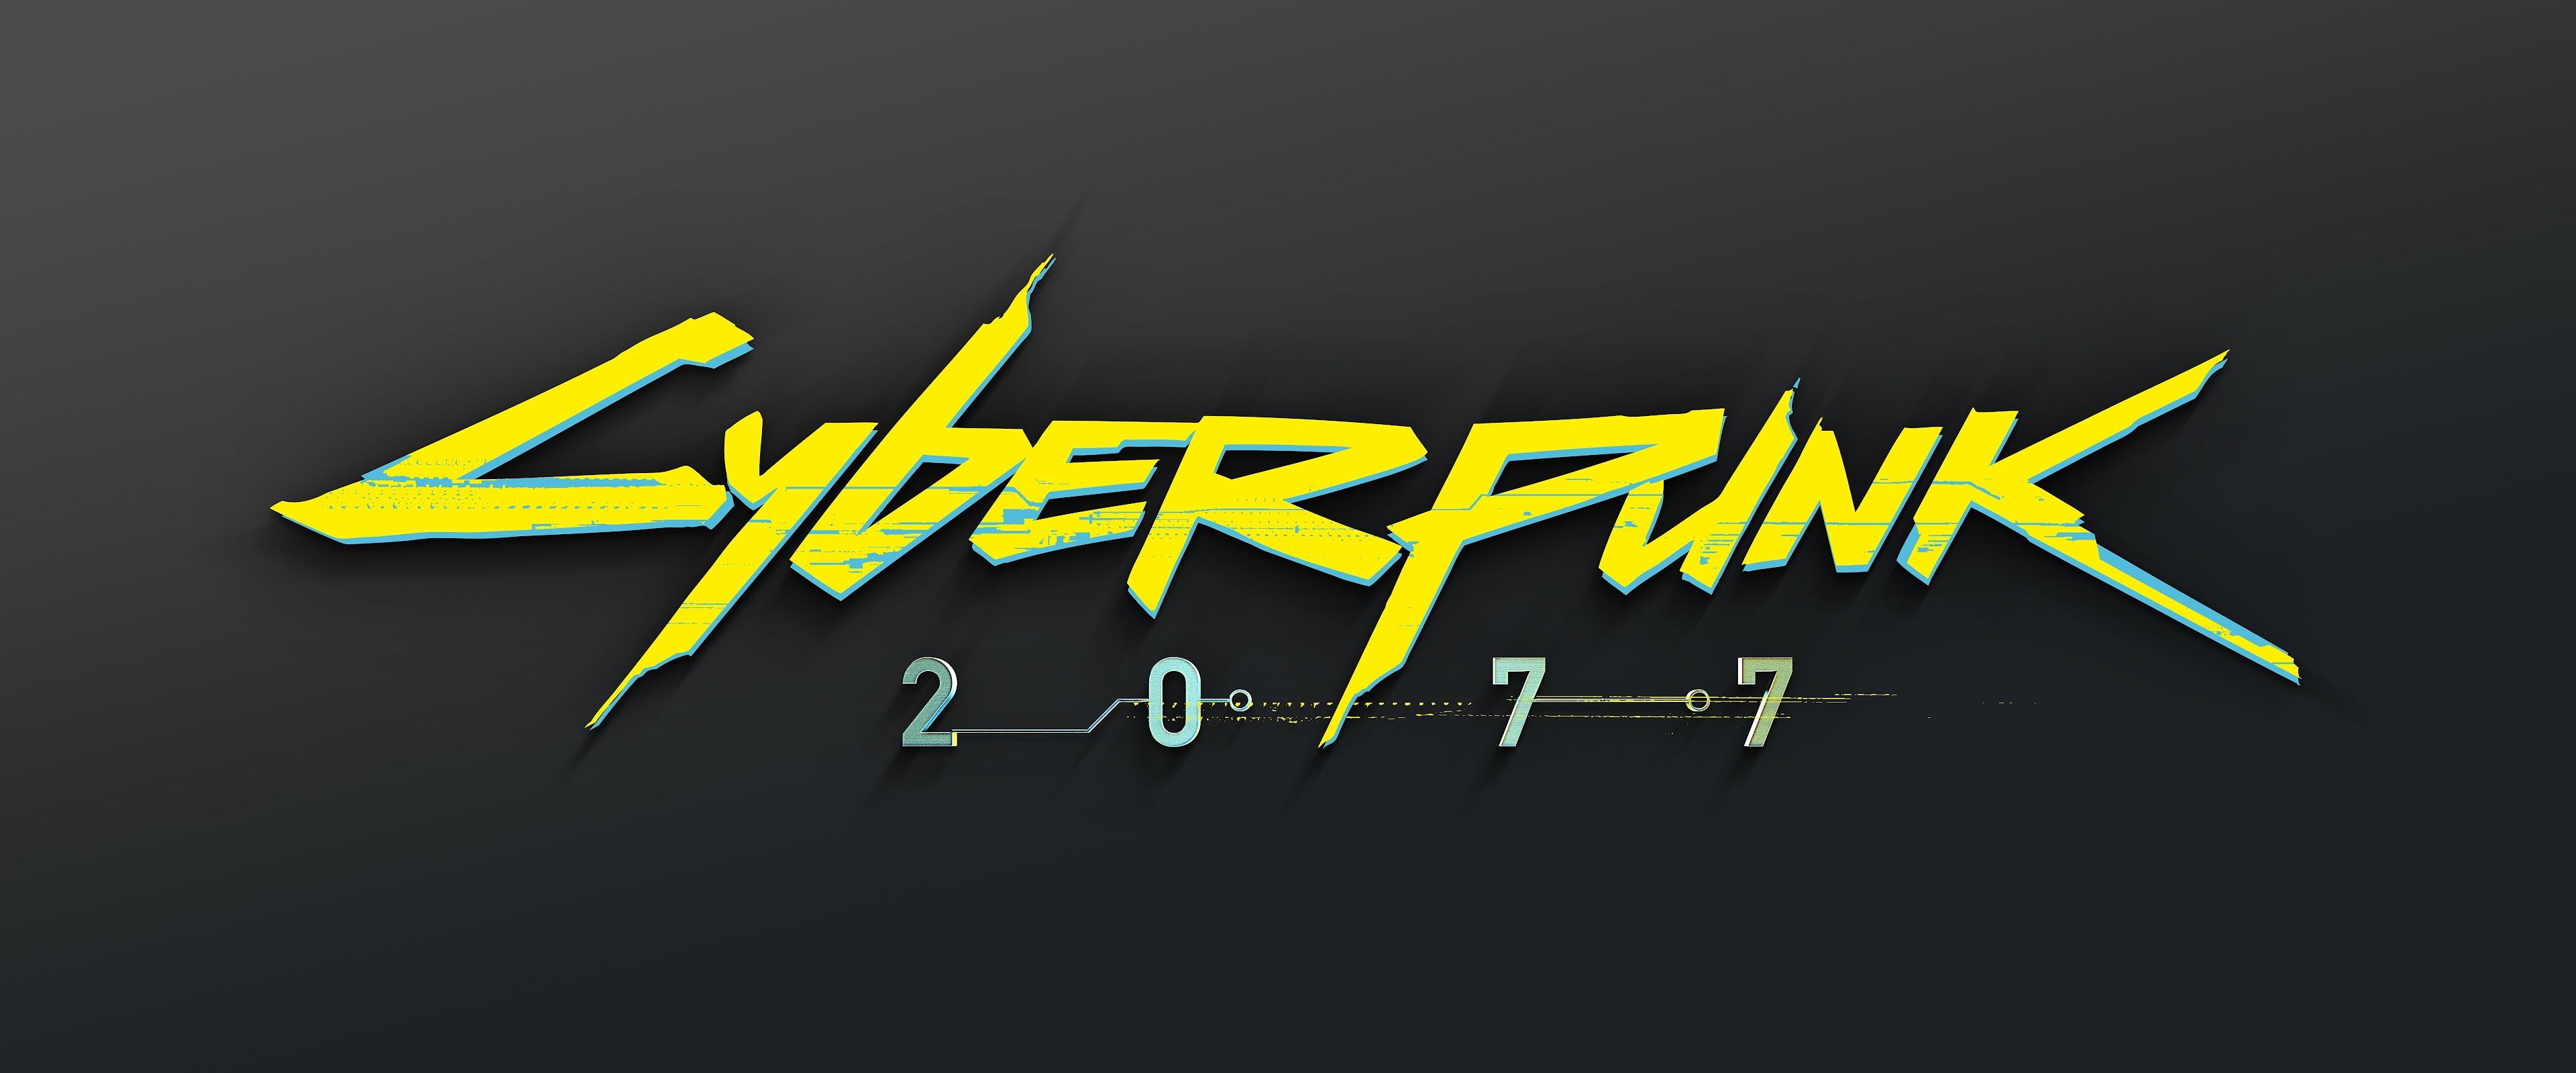 Cyberpunk 2077, Logo, 8K, #35 Wallpaper